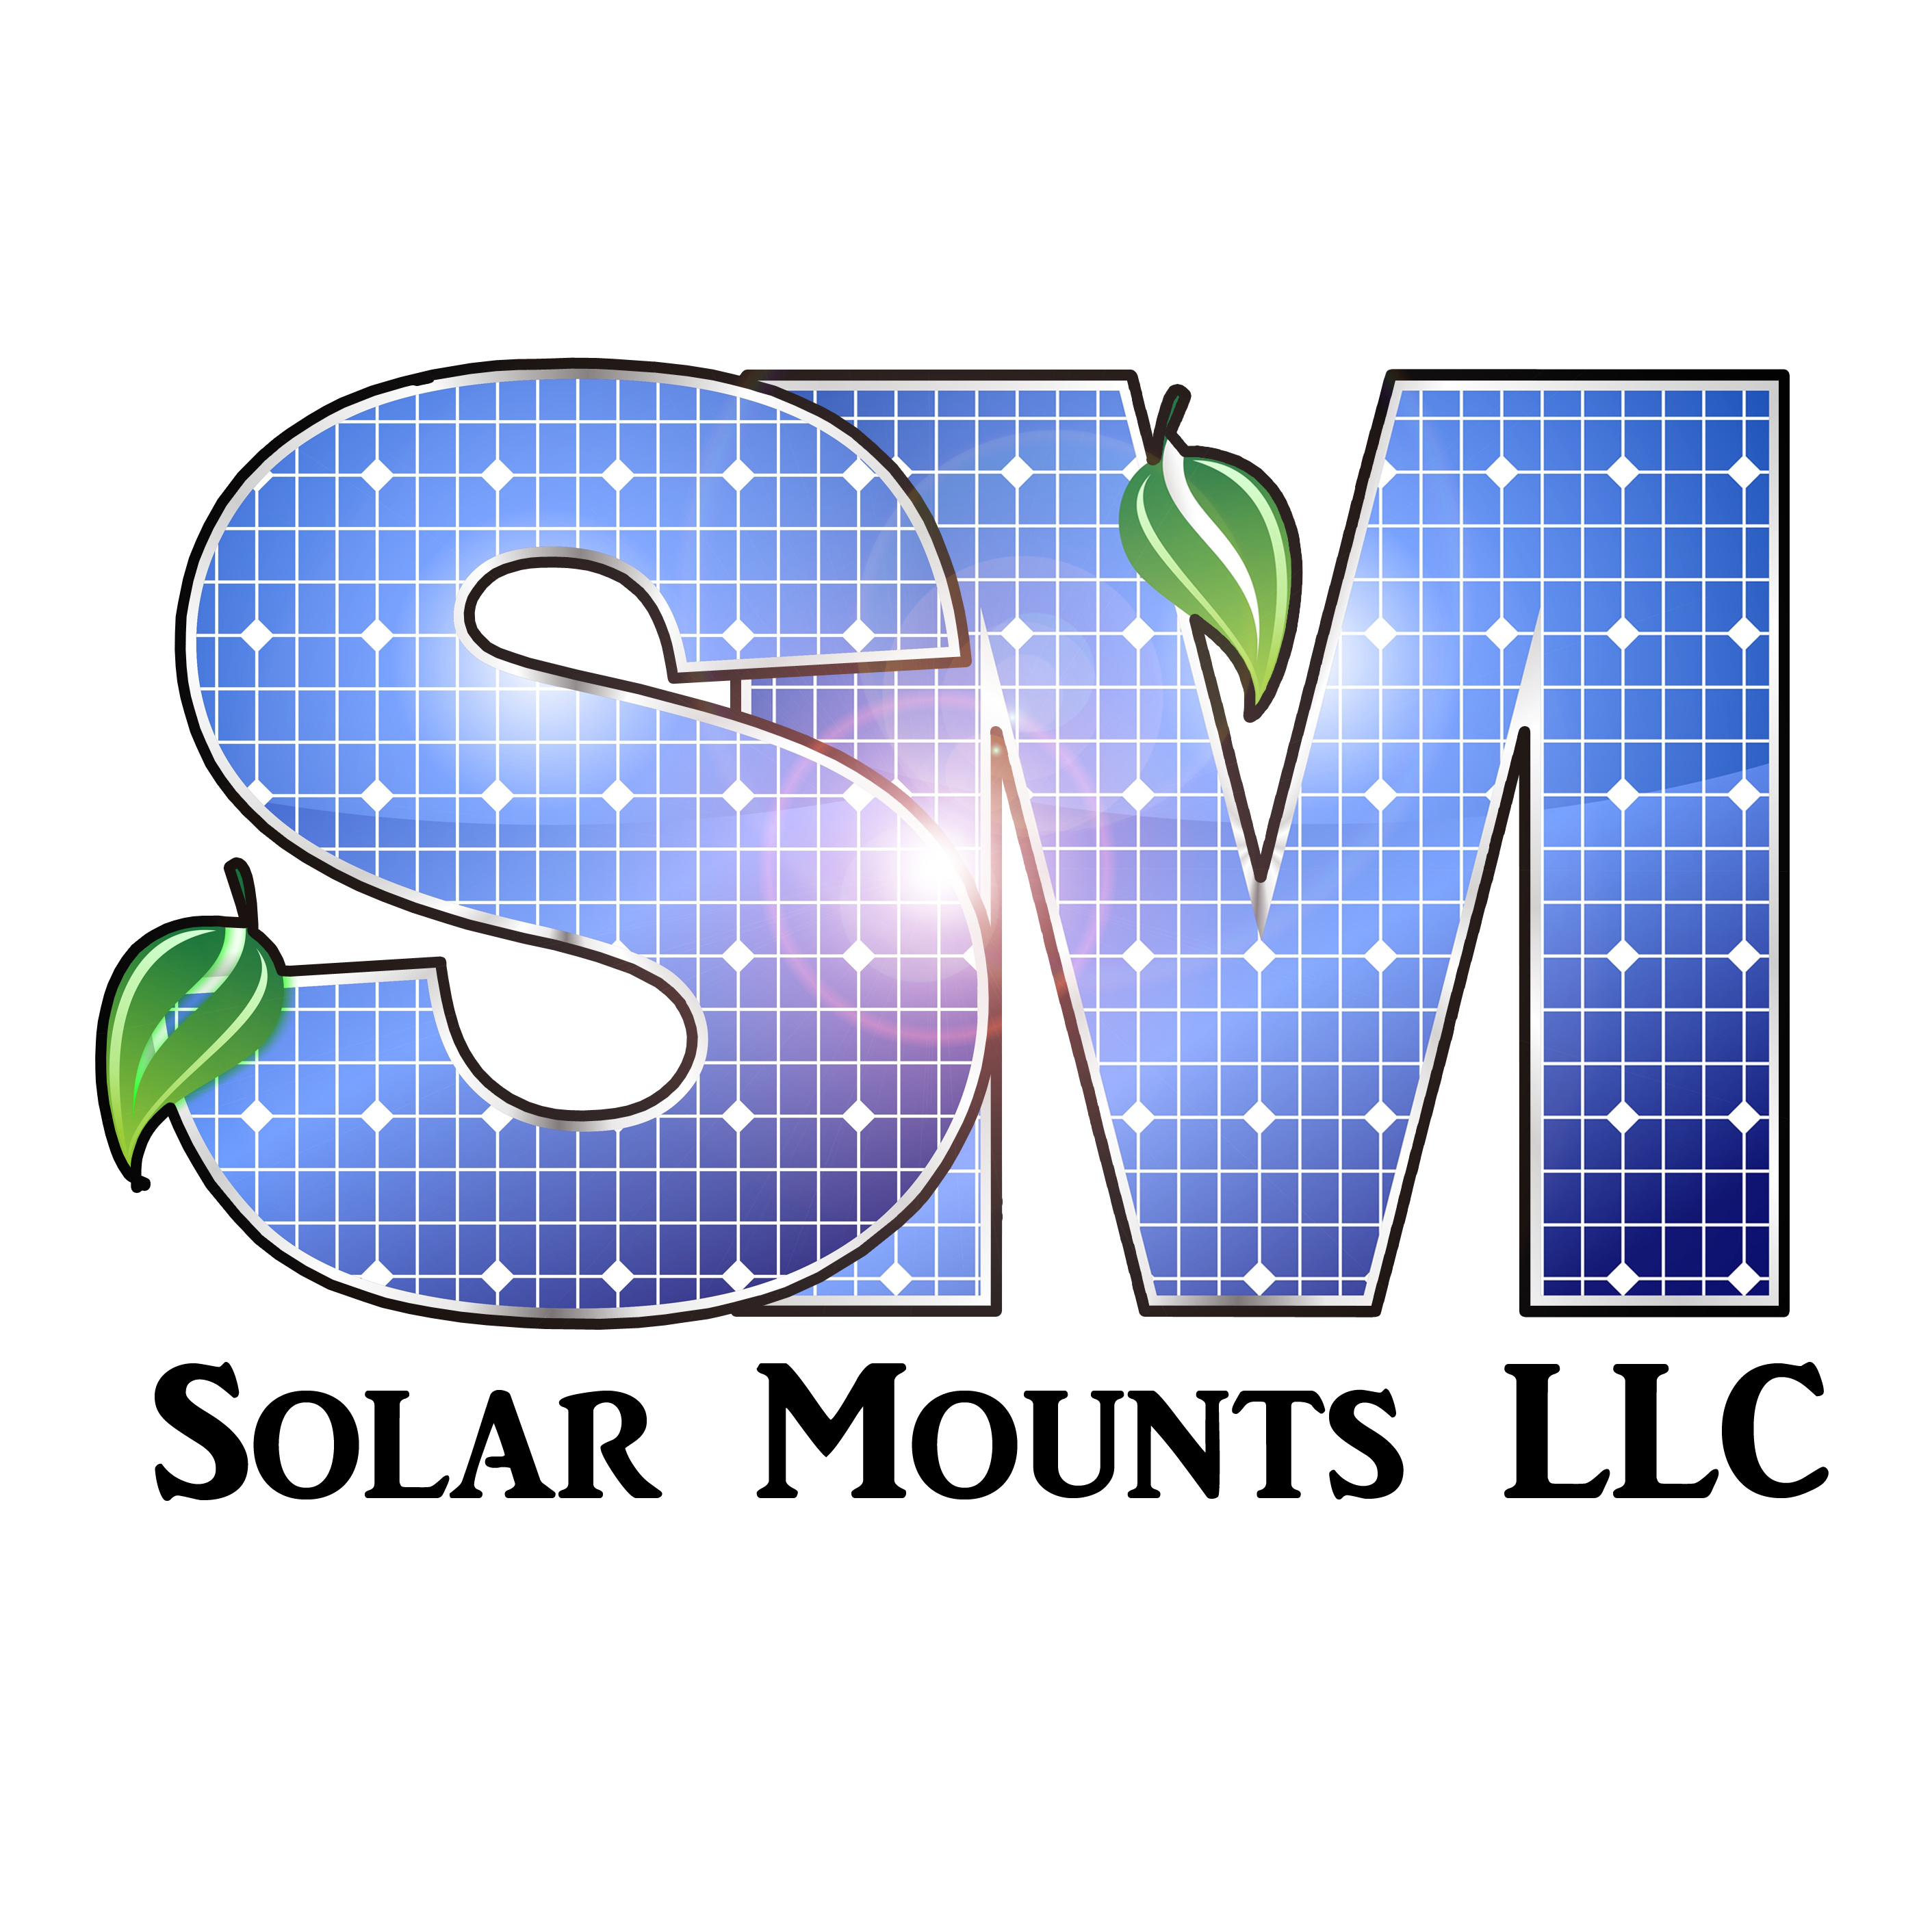 Solar Mounts LLC - Marshall, MI 49068 - (844)757-7225 | ShowMeLocal.com